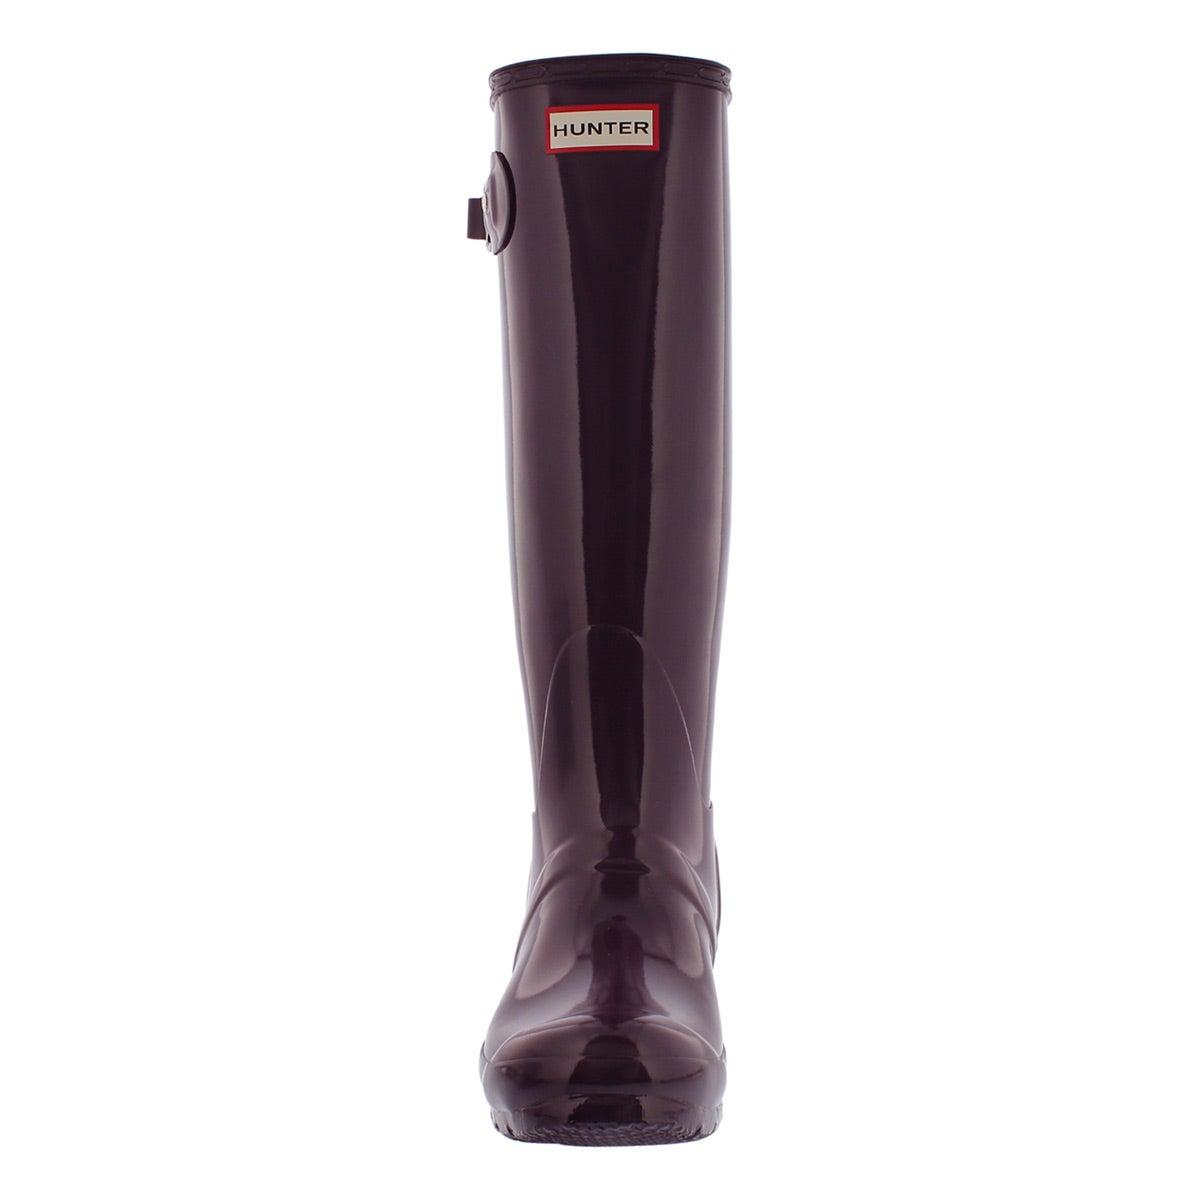 Lds Original Tall Gloss purple rain boot